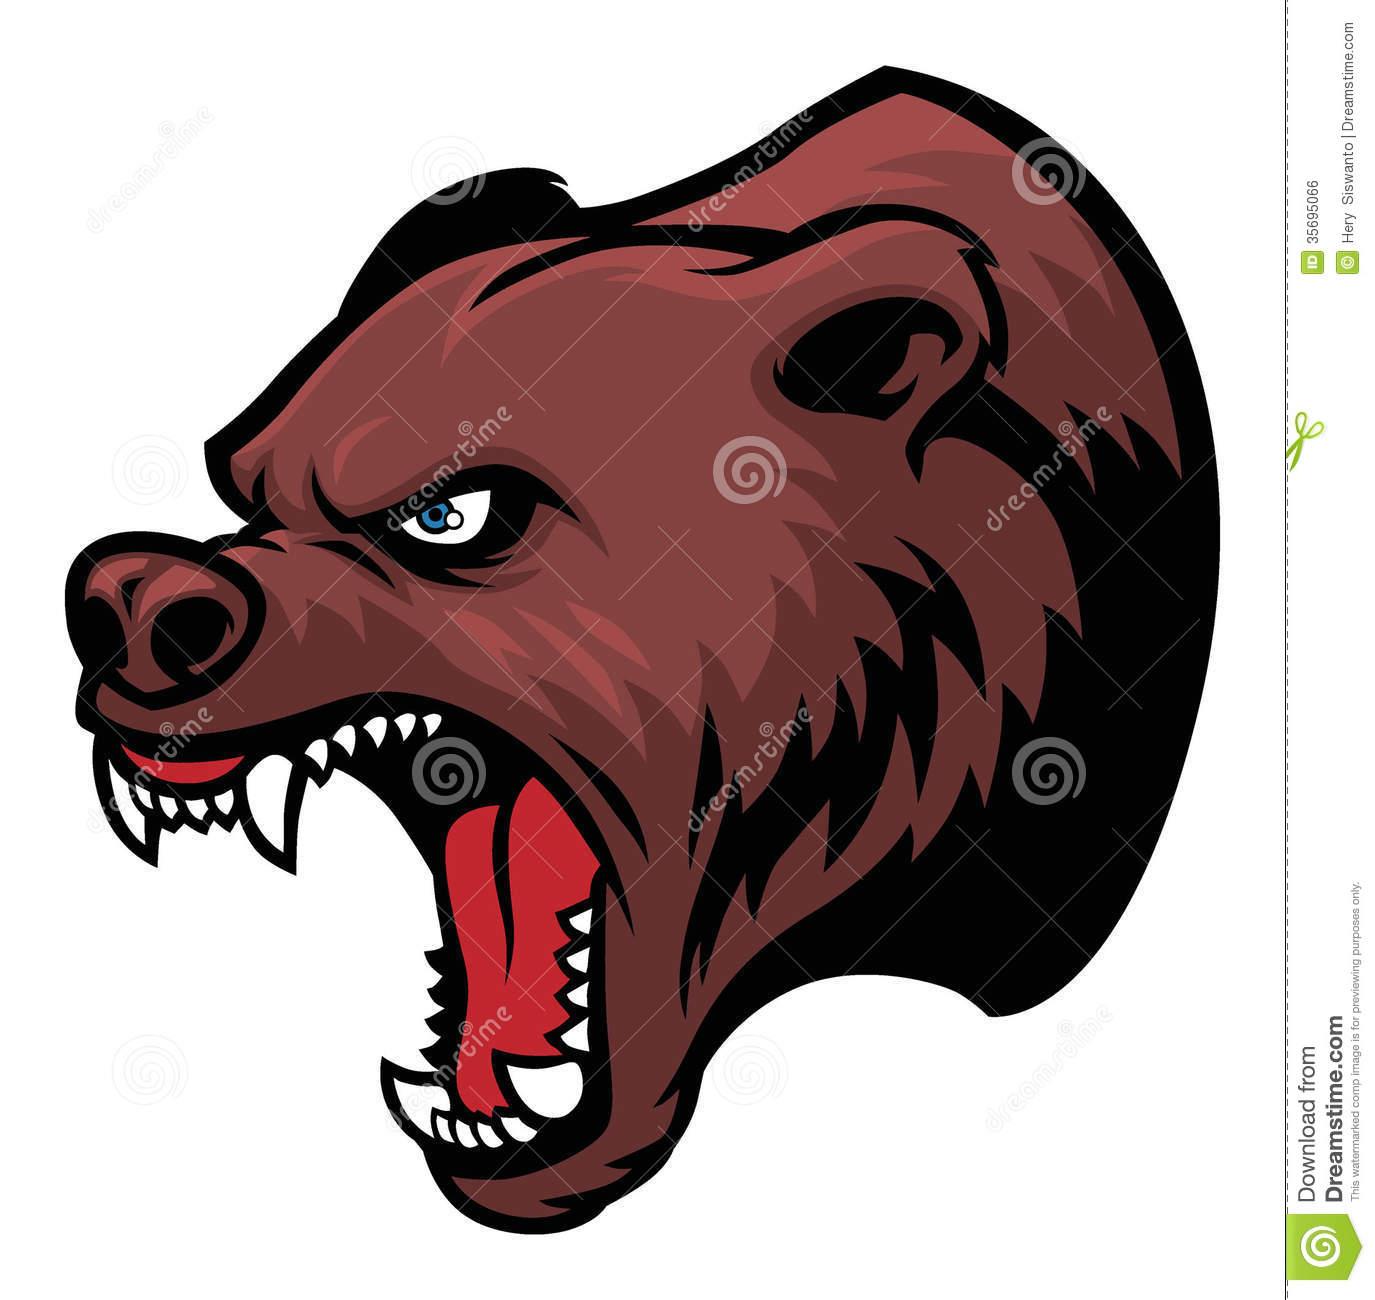 Angry momma bear clipart